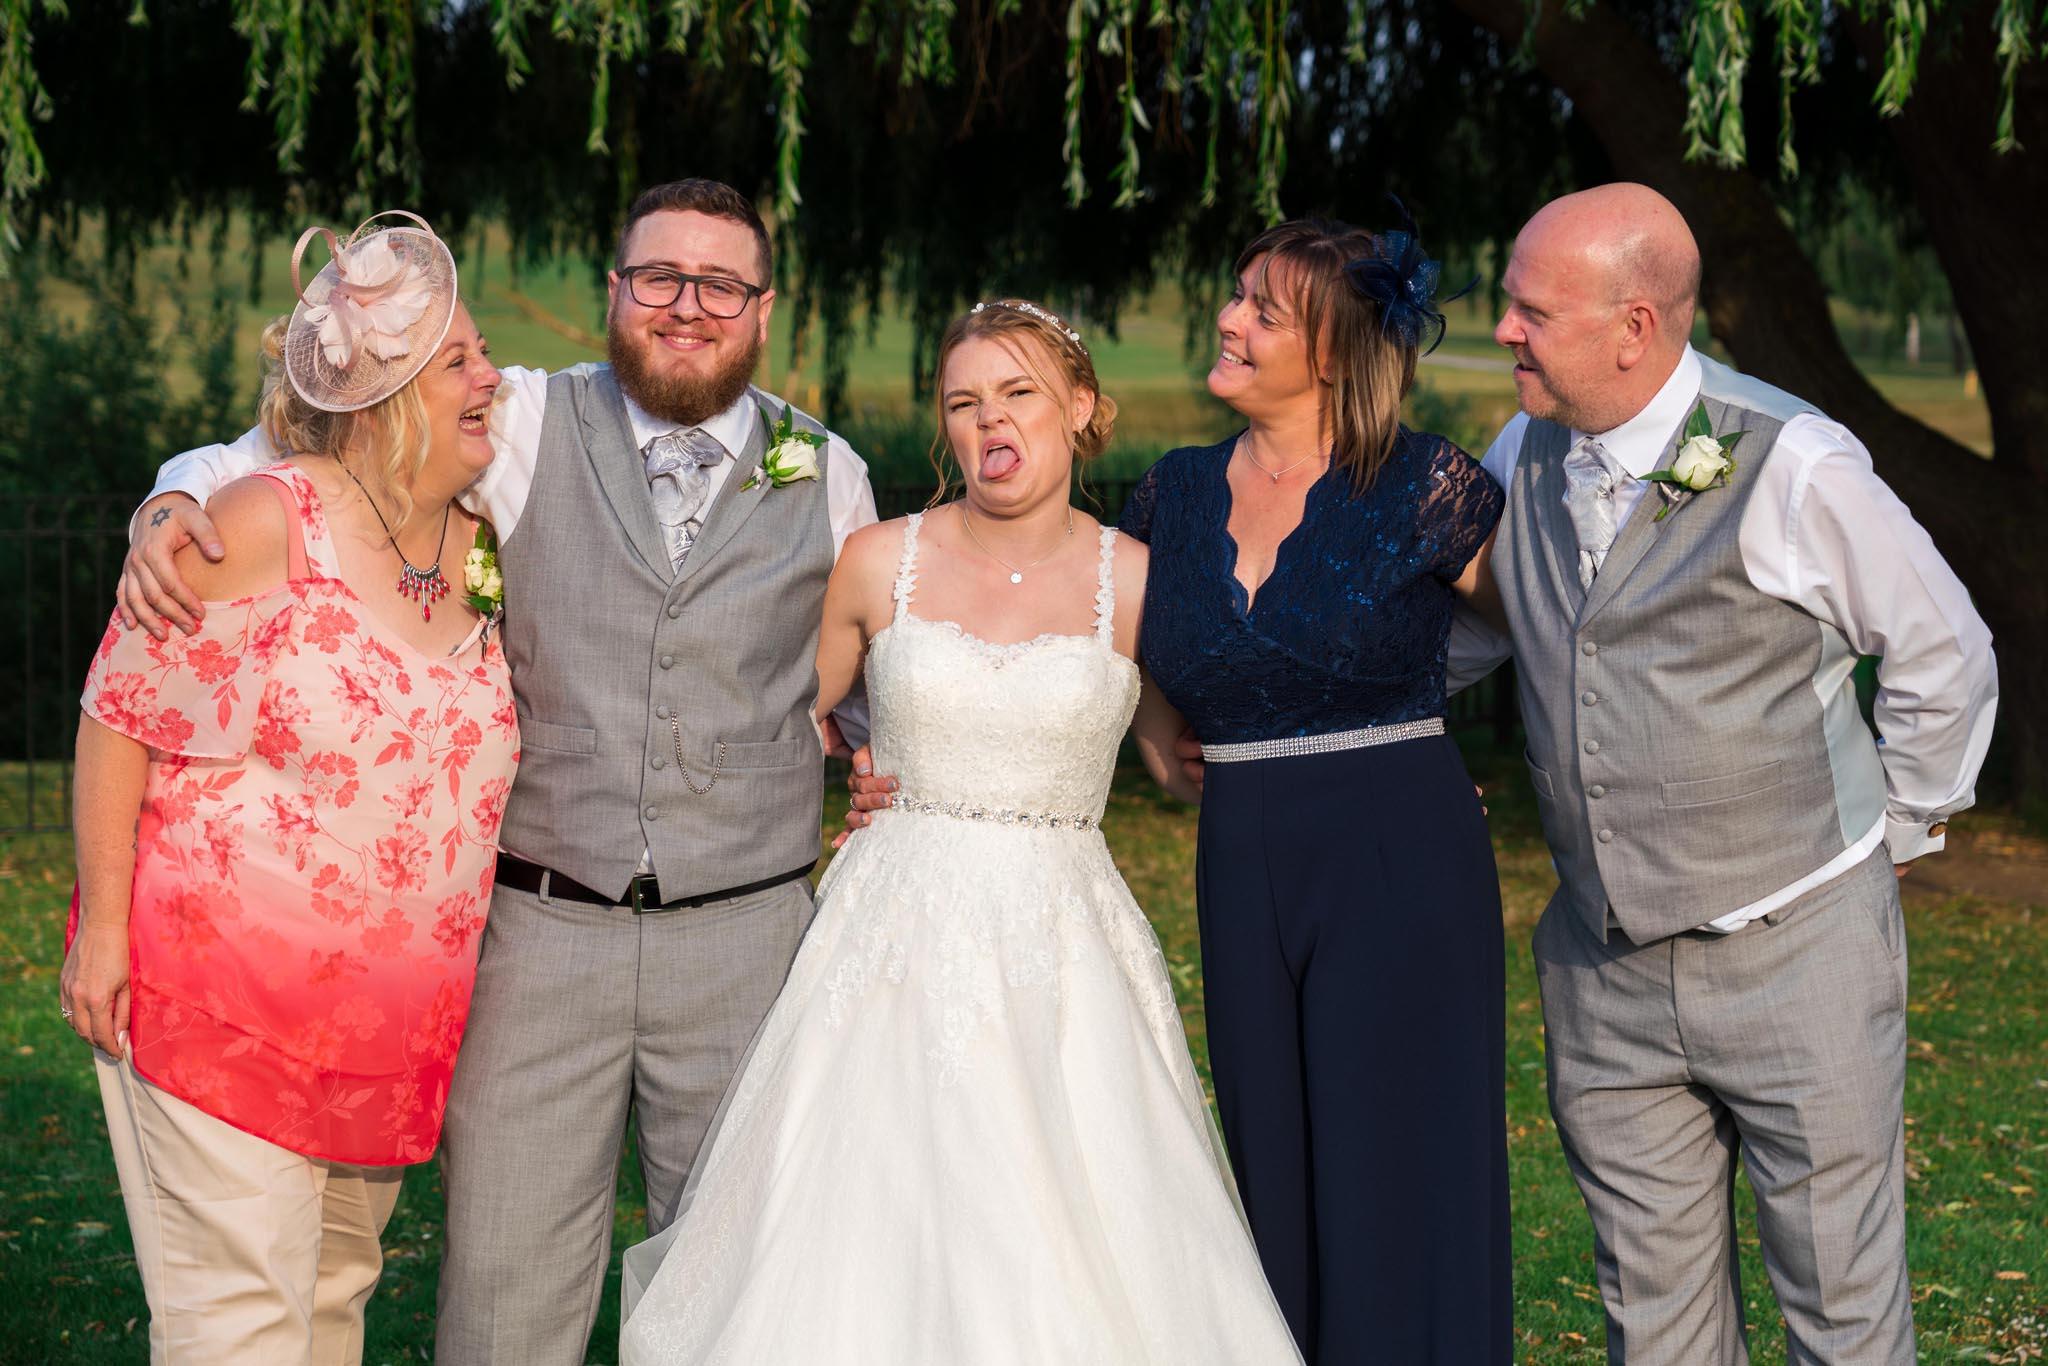 693-family-friends-Luke-Yasmin-The-Rayleigh-Club-Wedding-Photography.jpg